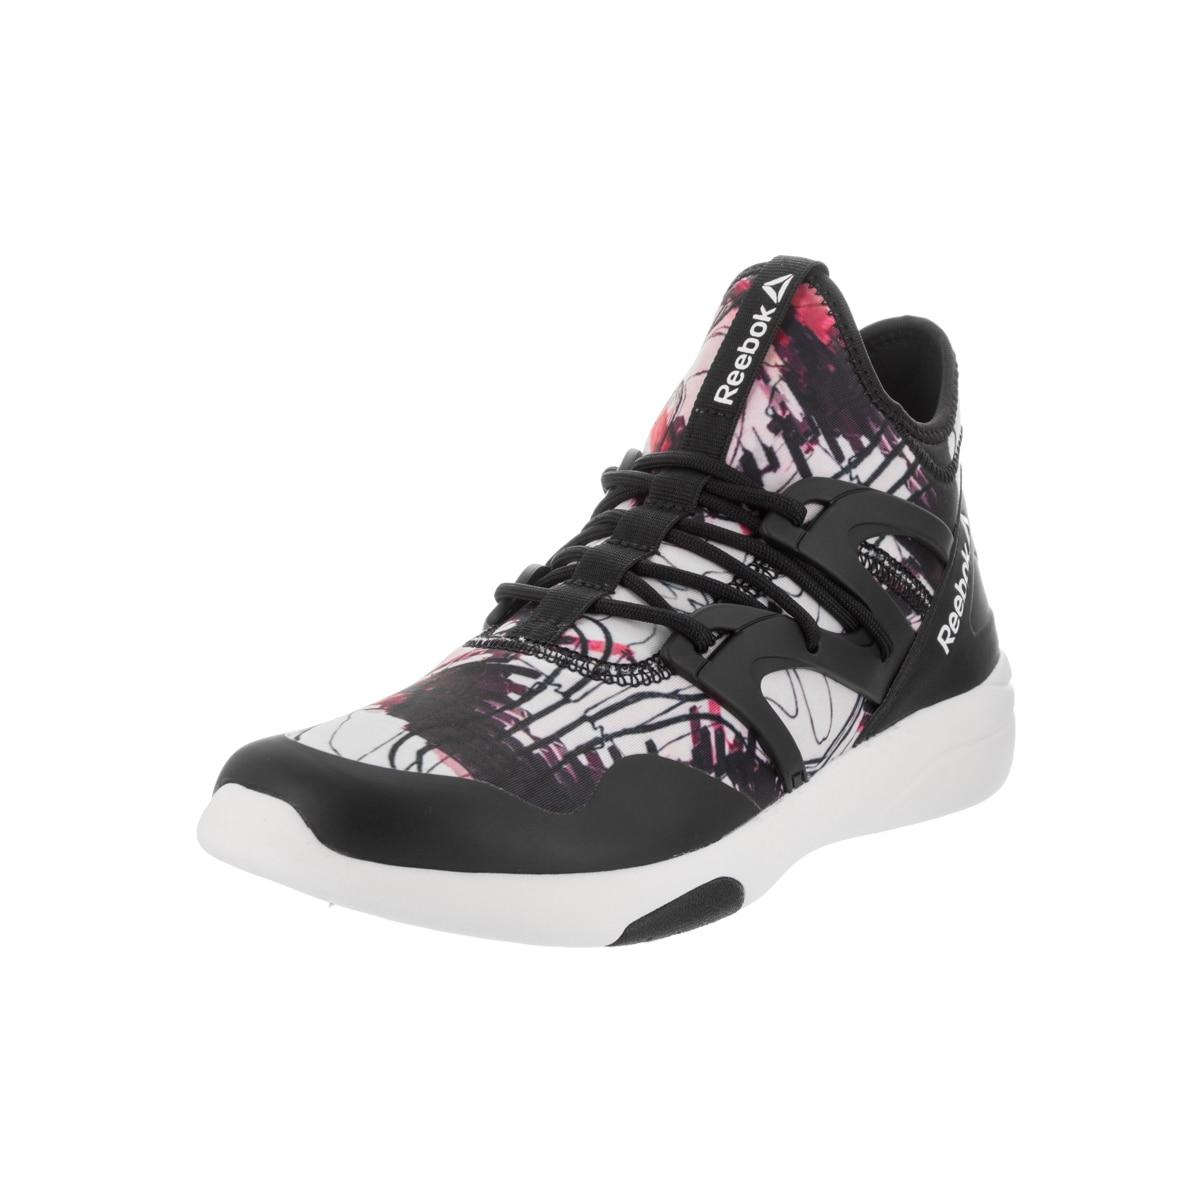 Hayasu Training Shoe - Overstock